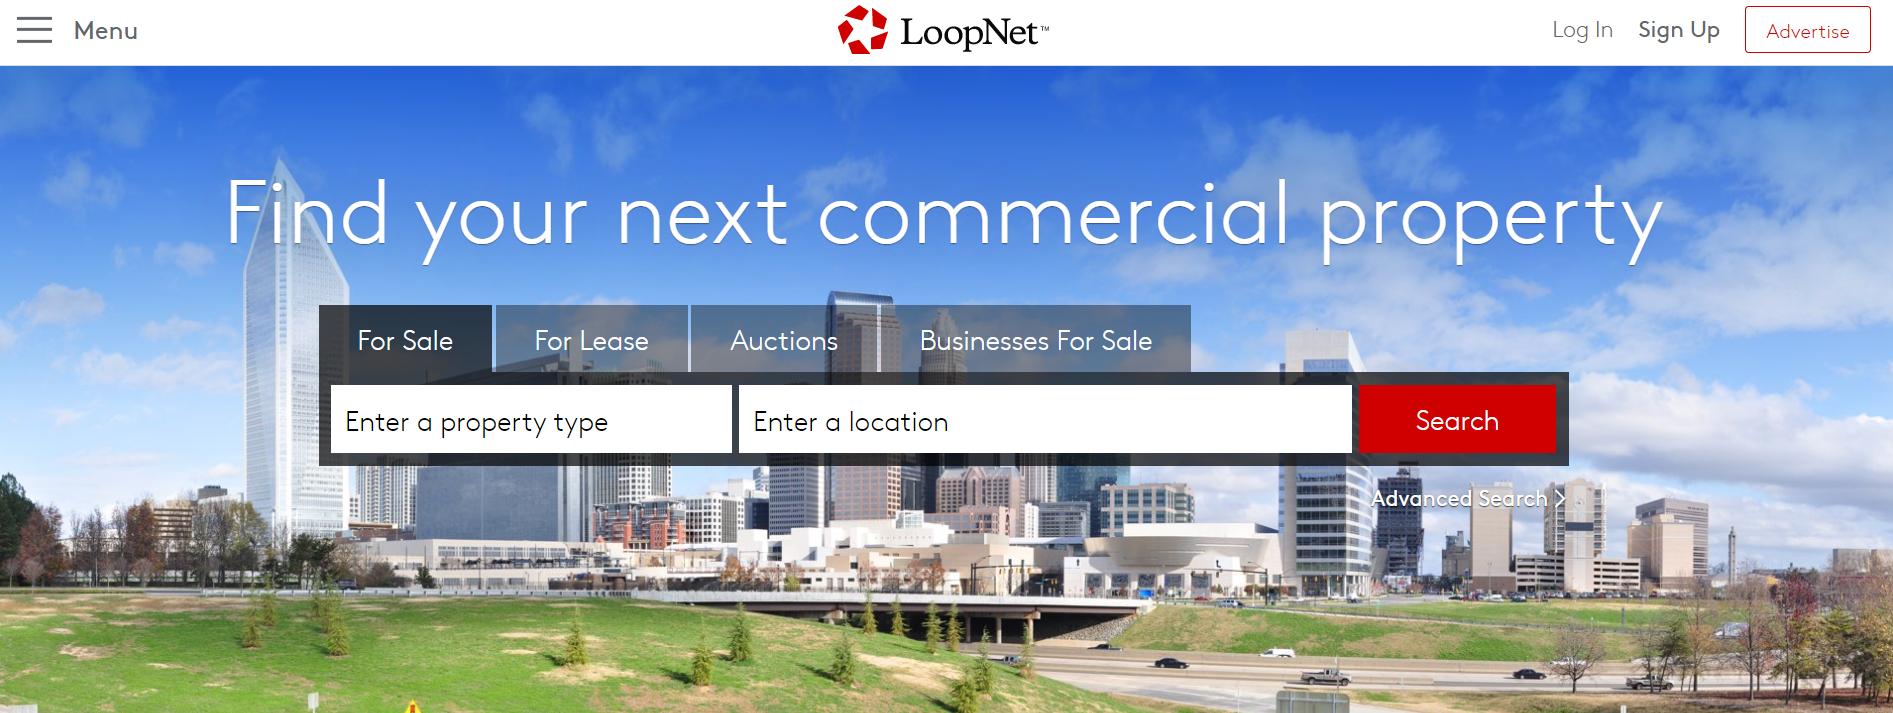 screenshot of the LoopNet website